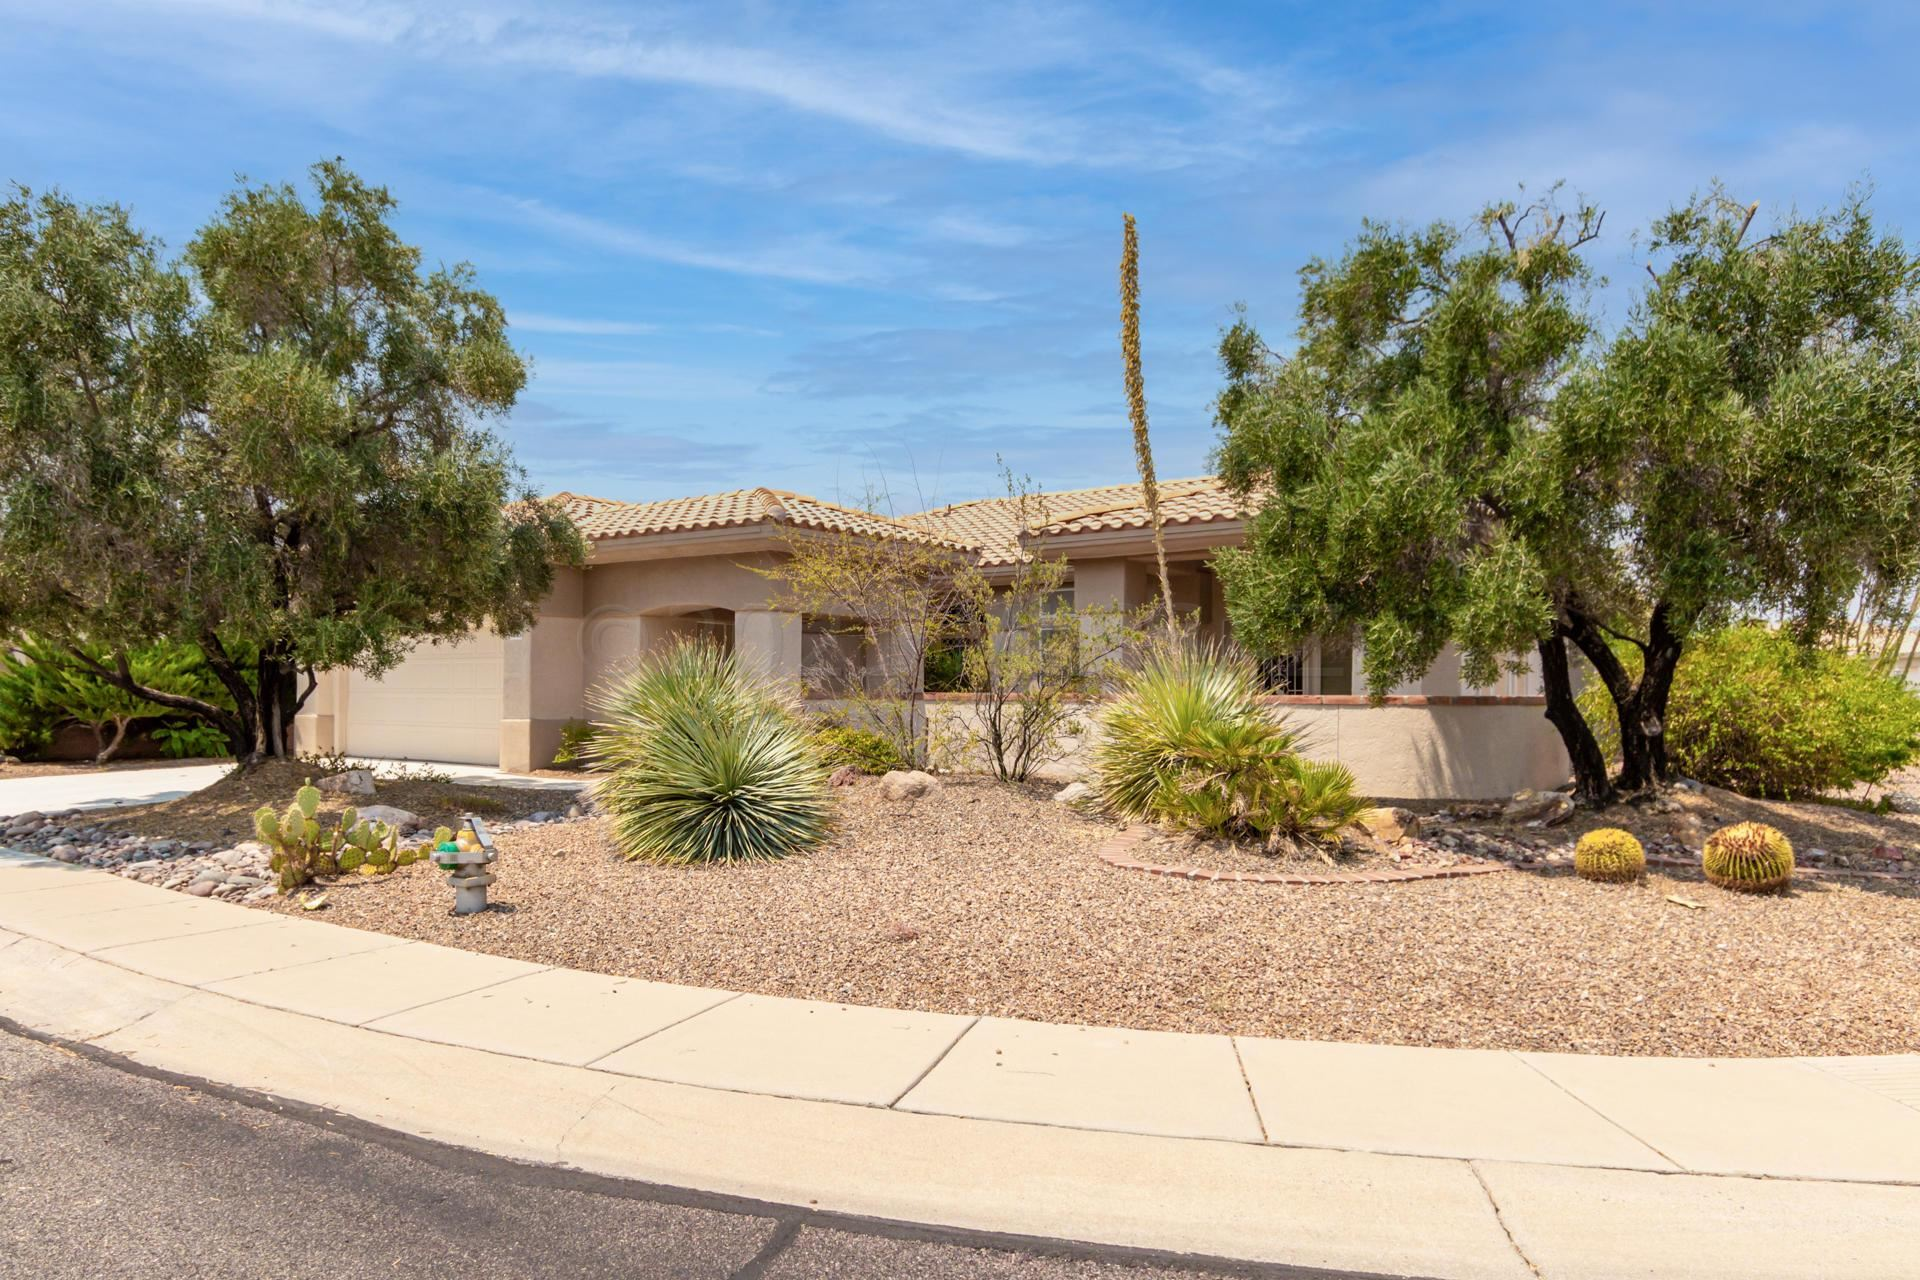 14725 N Desert Rock Drive, Oro Valley, AZ 85755 - MLS#: 22115706